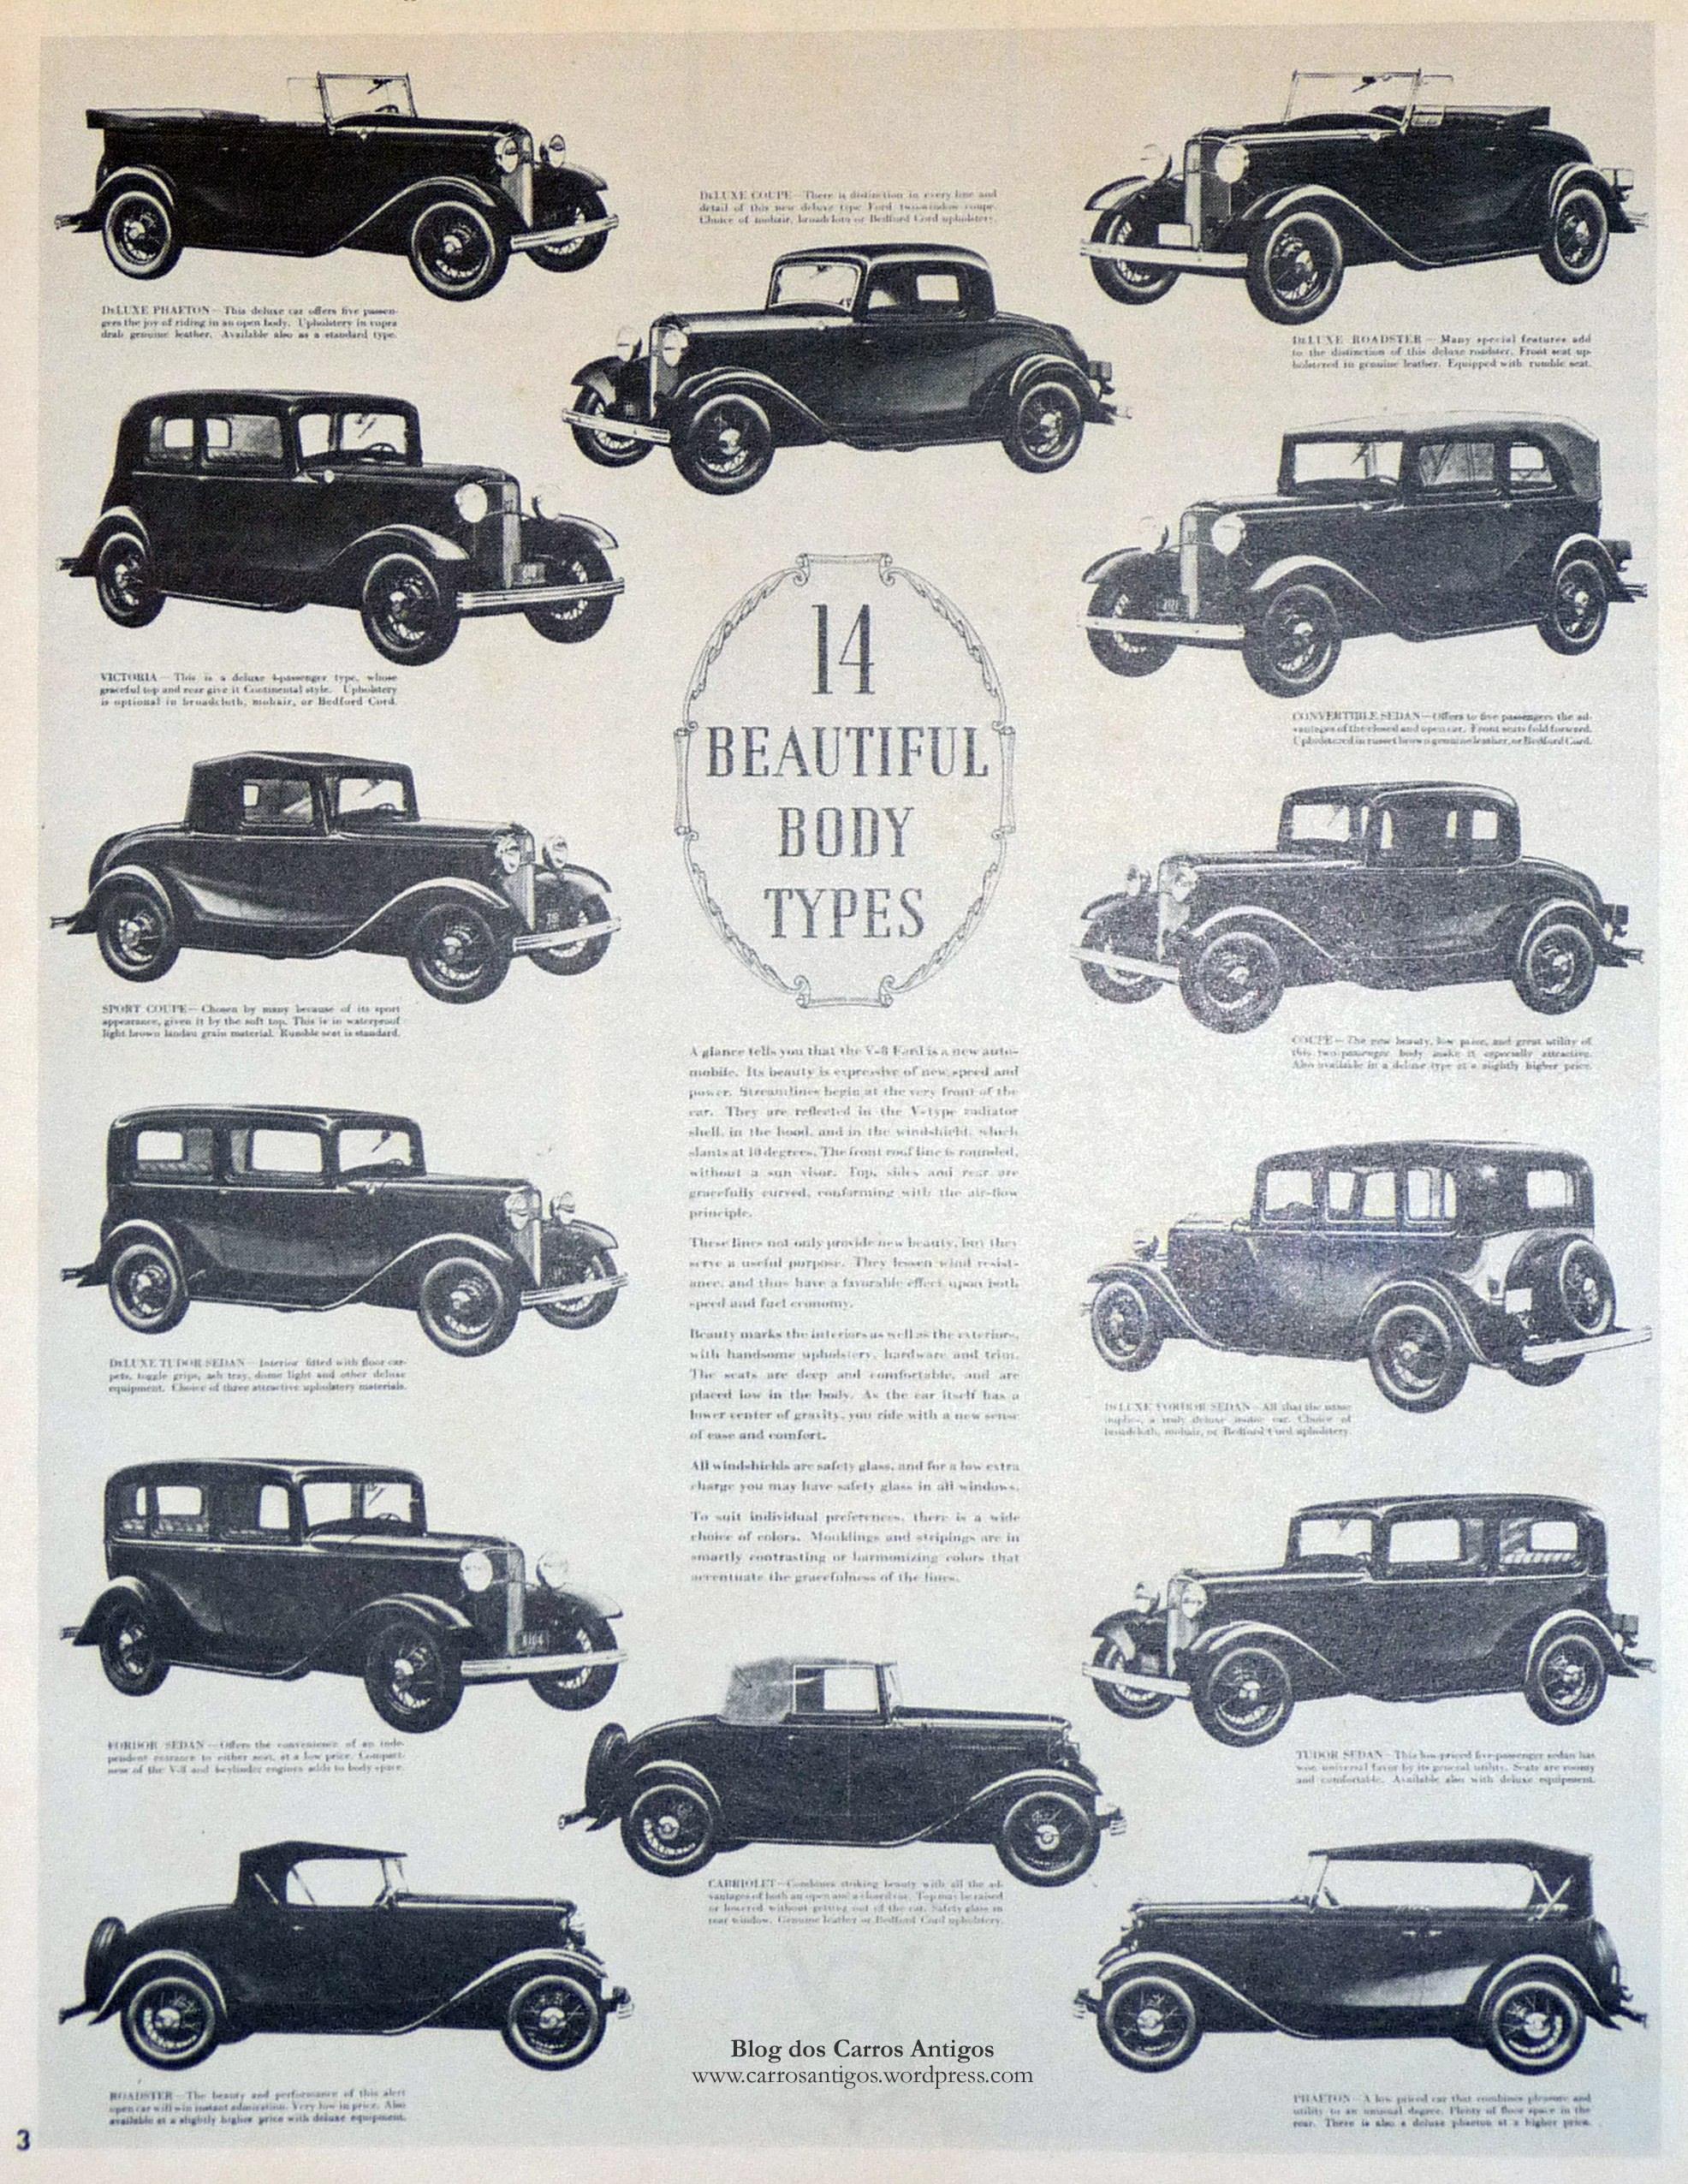 f150 body styles auto parts diagrams. Black Bedroom Furniture Sets. Home Design Ideas